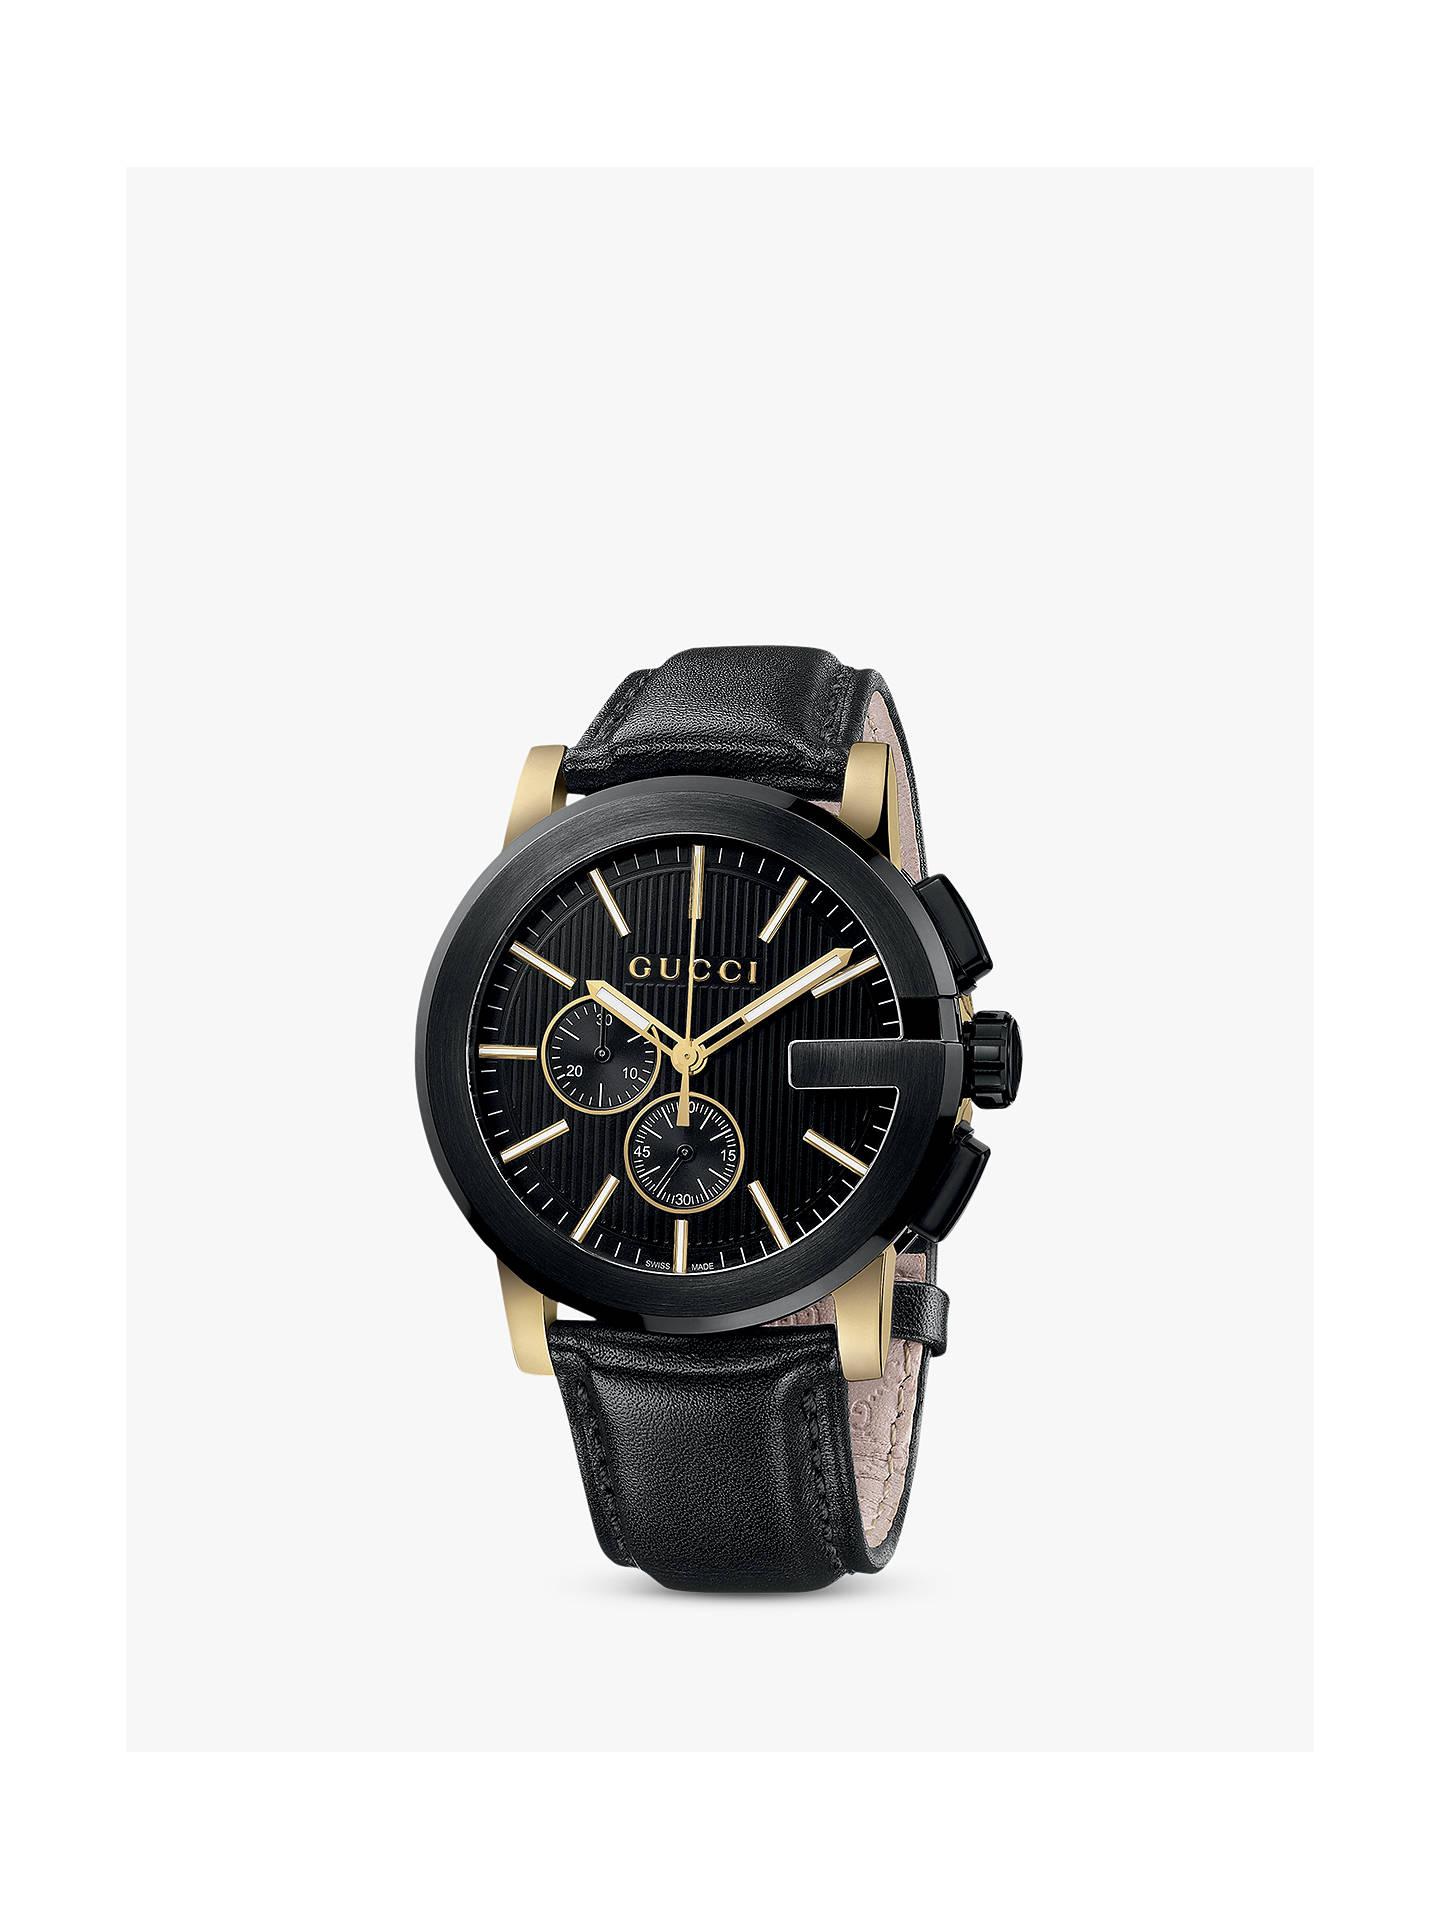 30b88c27e29 Buy Gucci YA101203 Men s G-Chrono Chronograph Leather Strap Watch